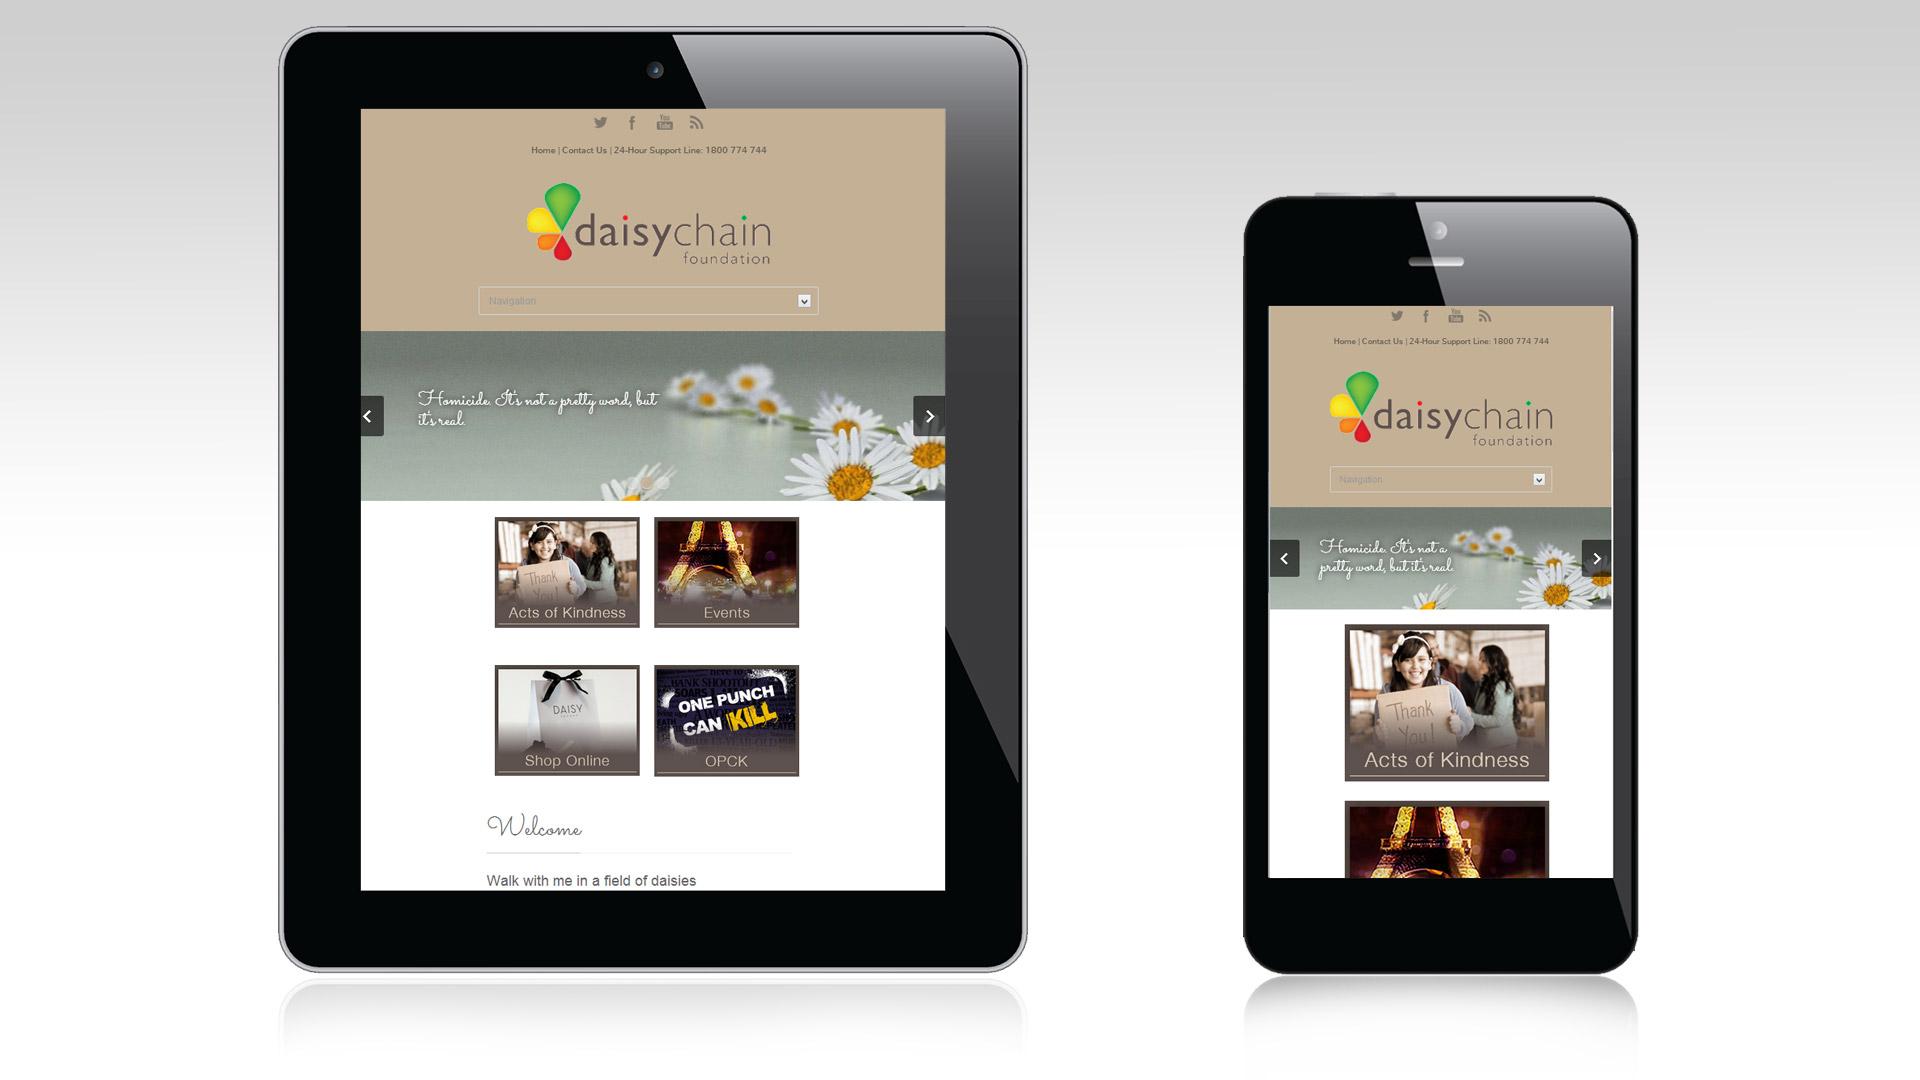 webdesign_daisychain03